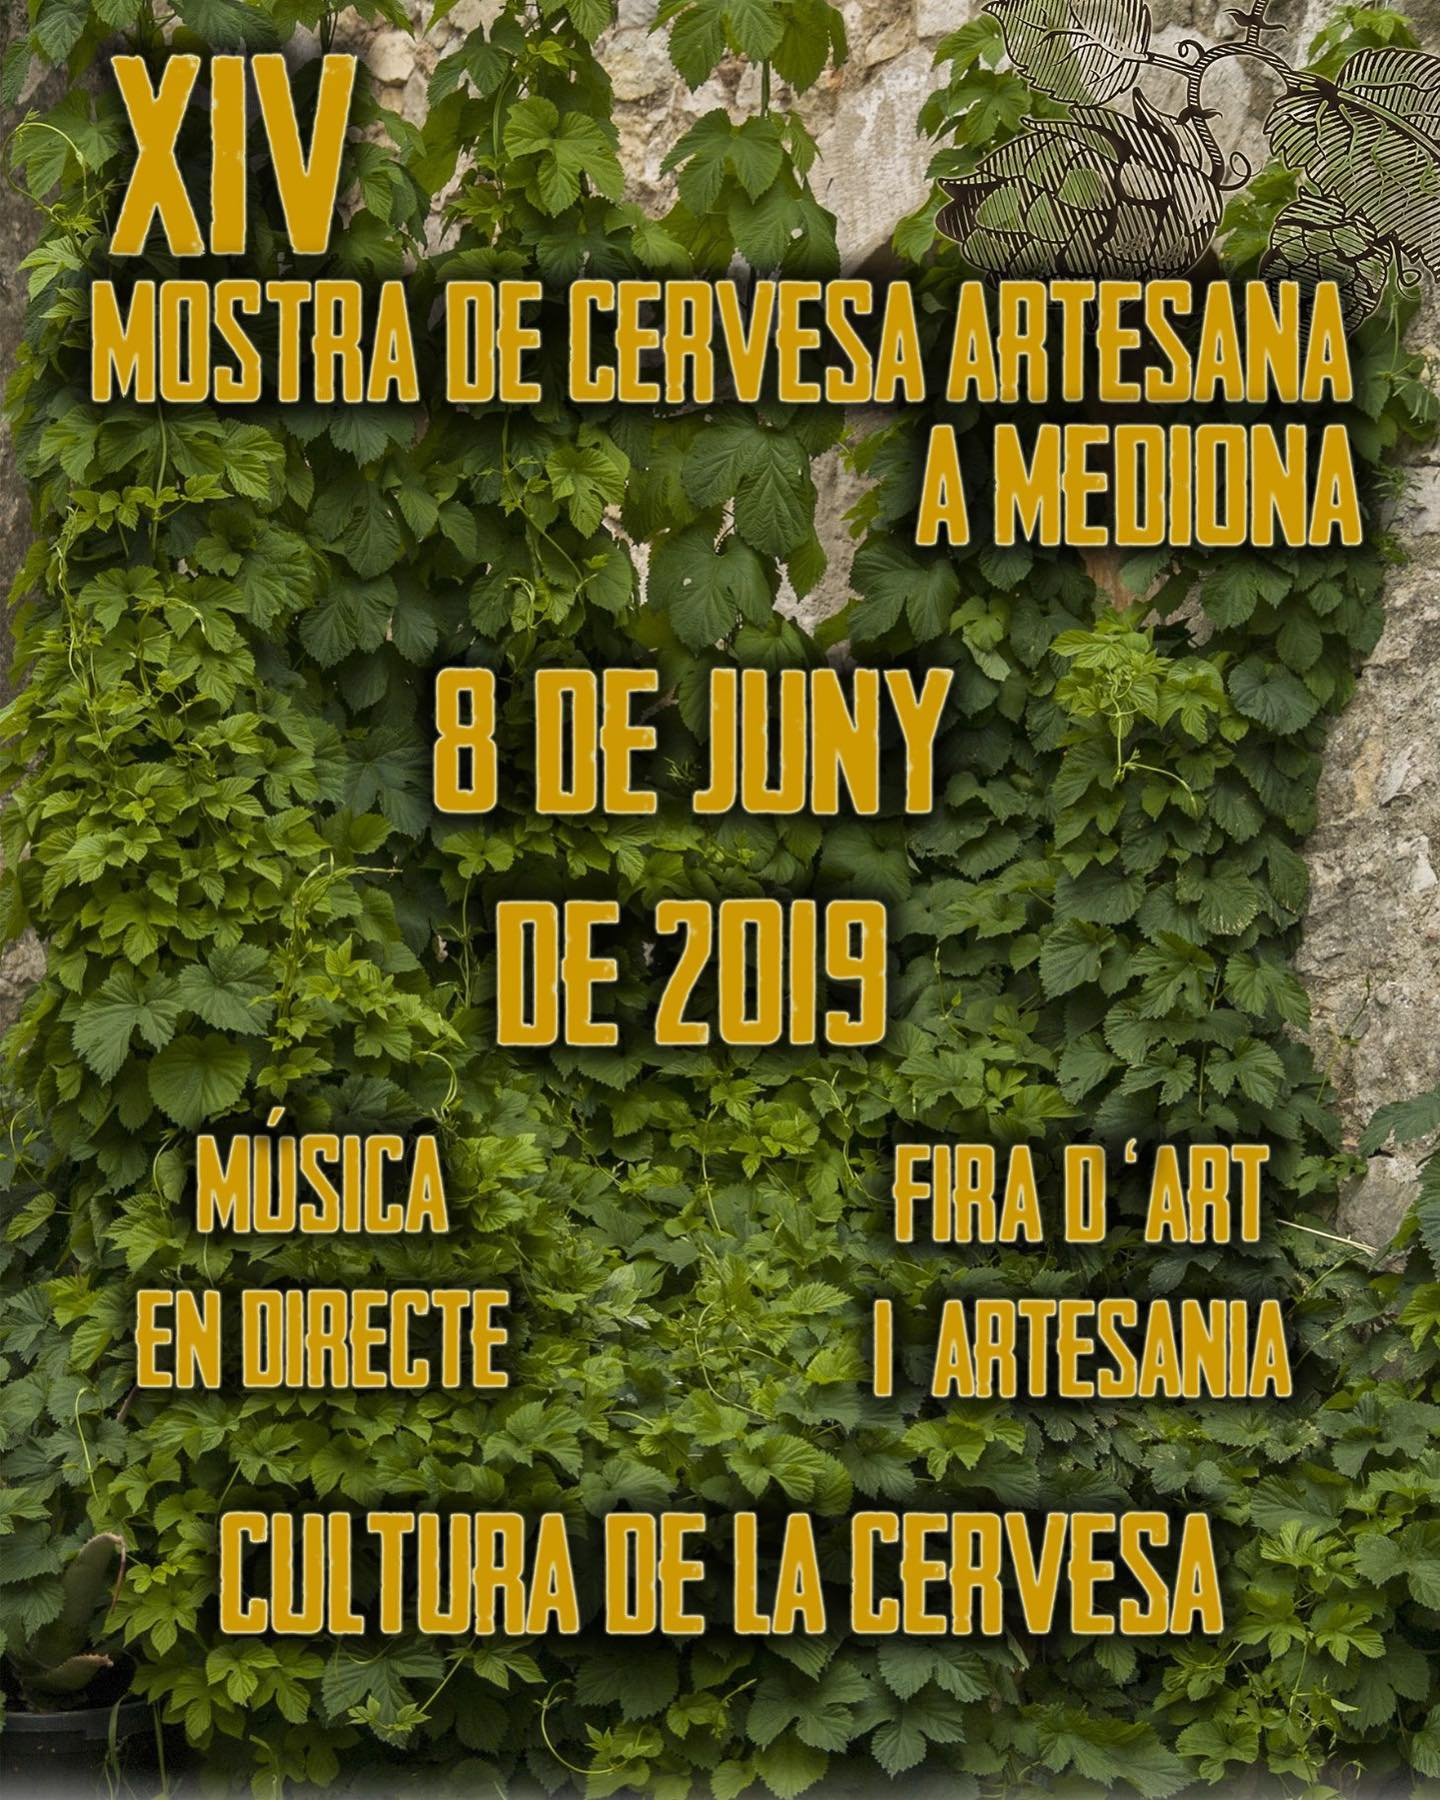 festival cerveza artesana mediona craft beer